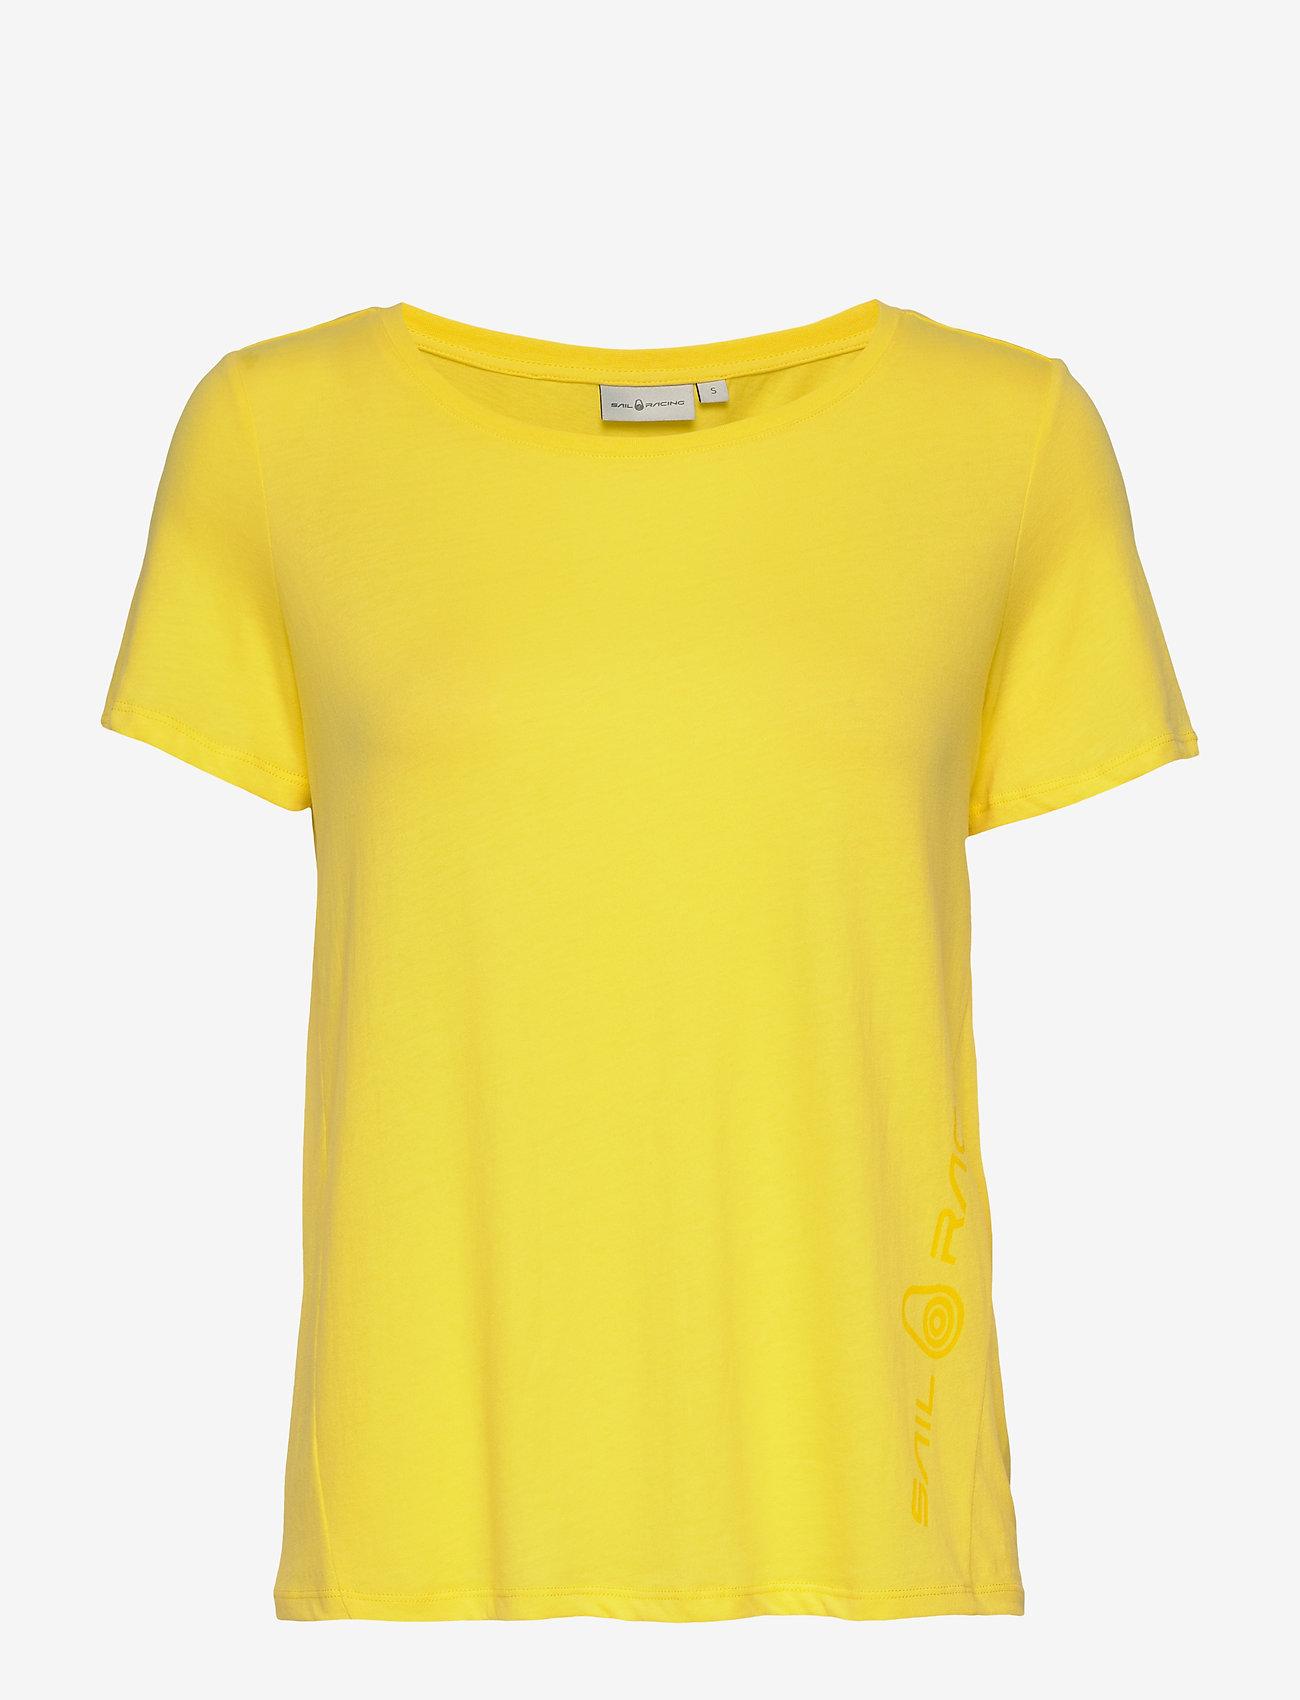 Sail Racing - W GAIL TEE#2 - t-shirts - light yellow - 0